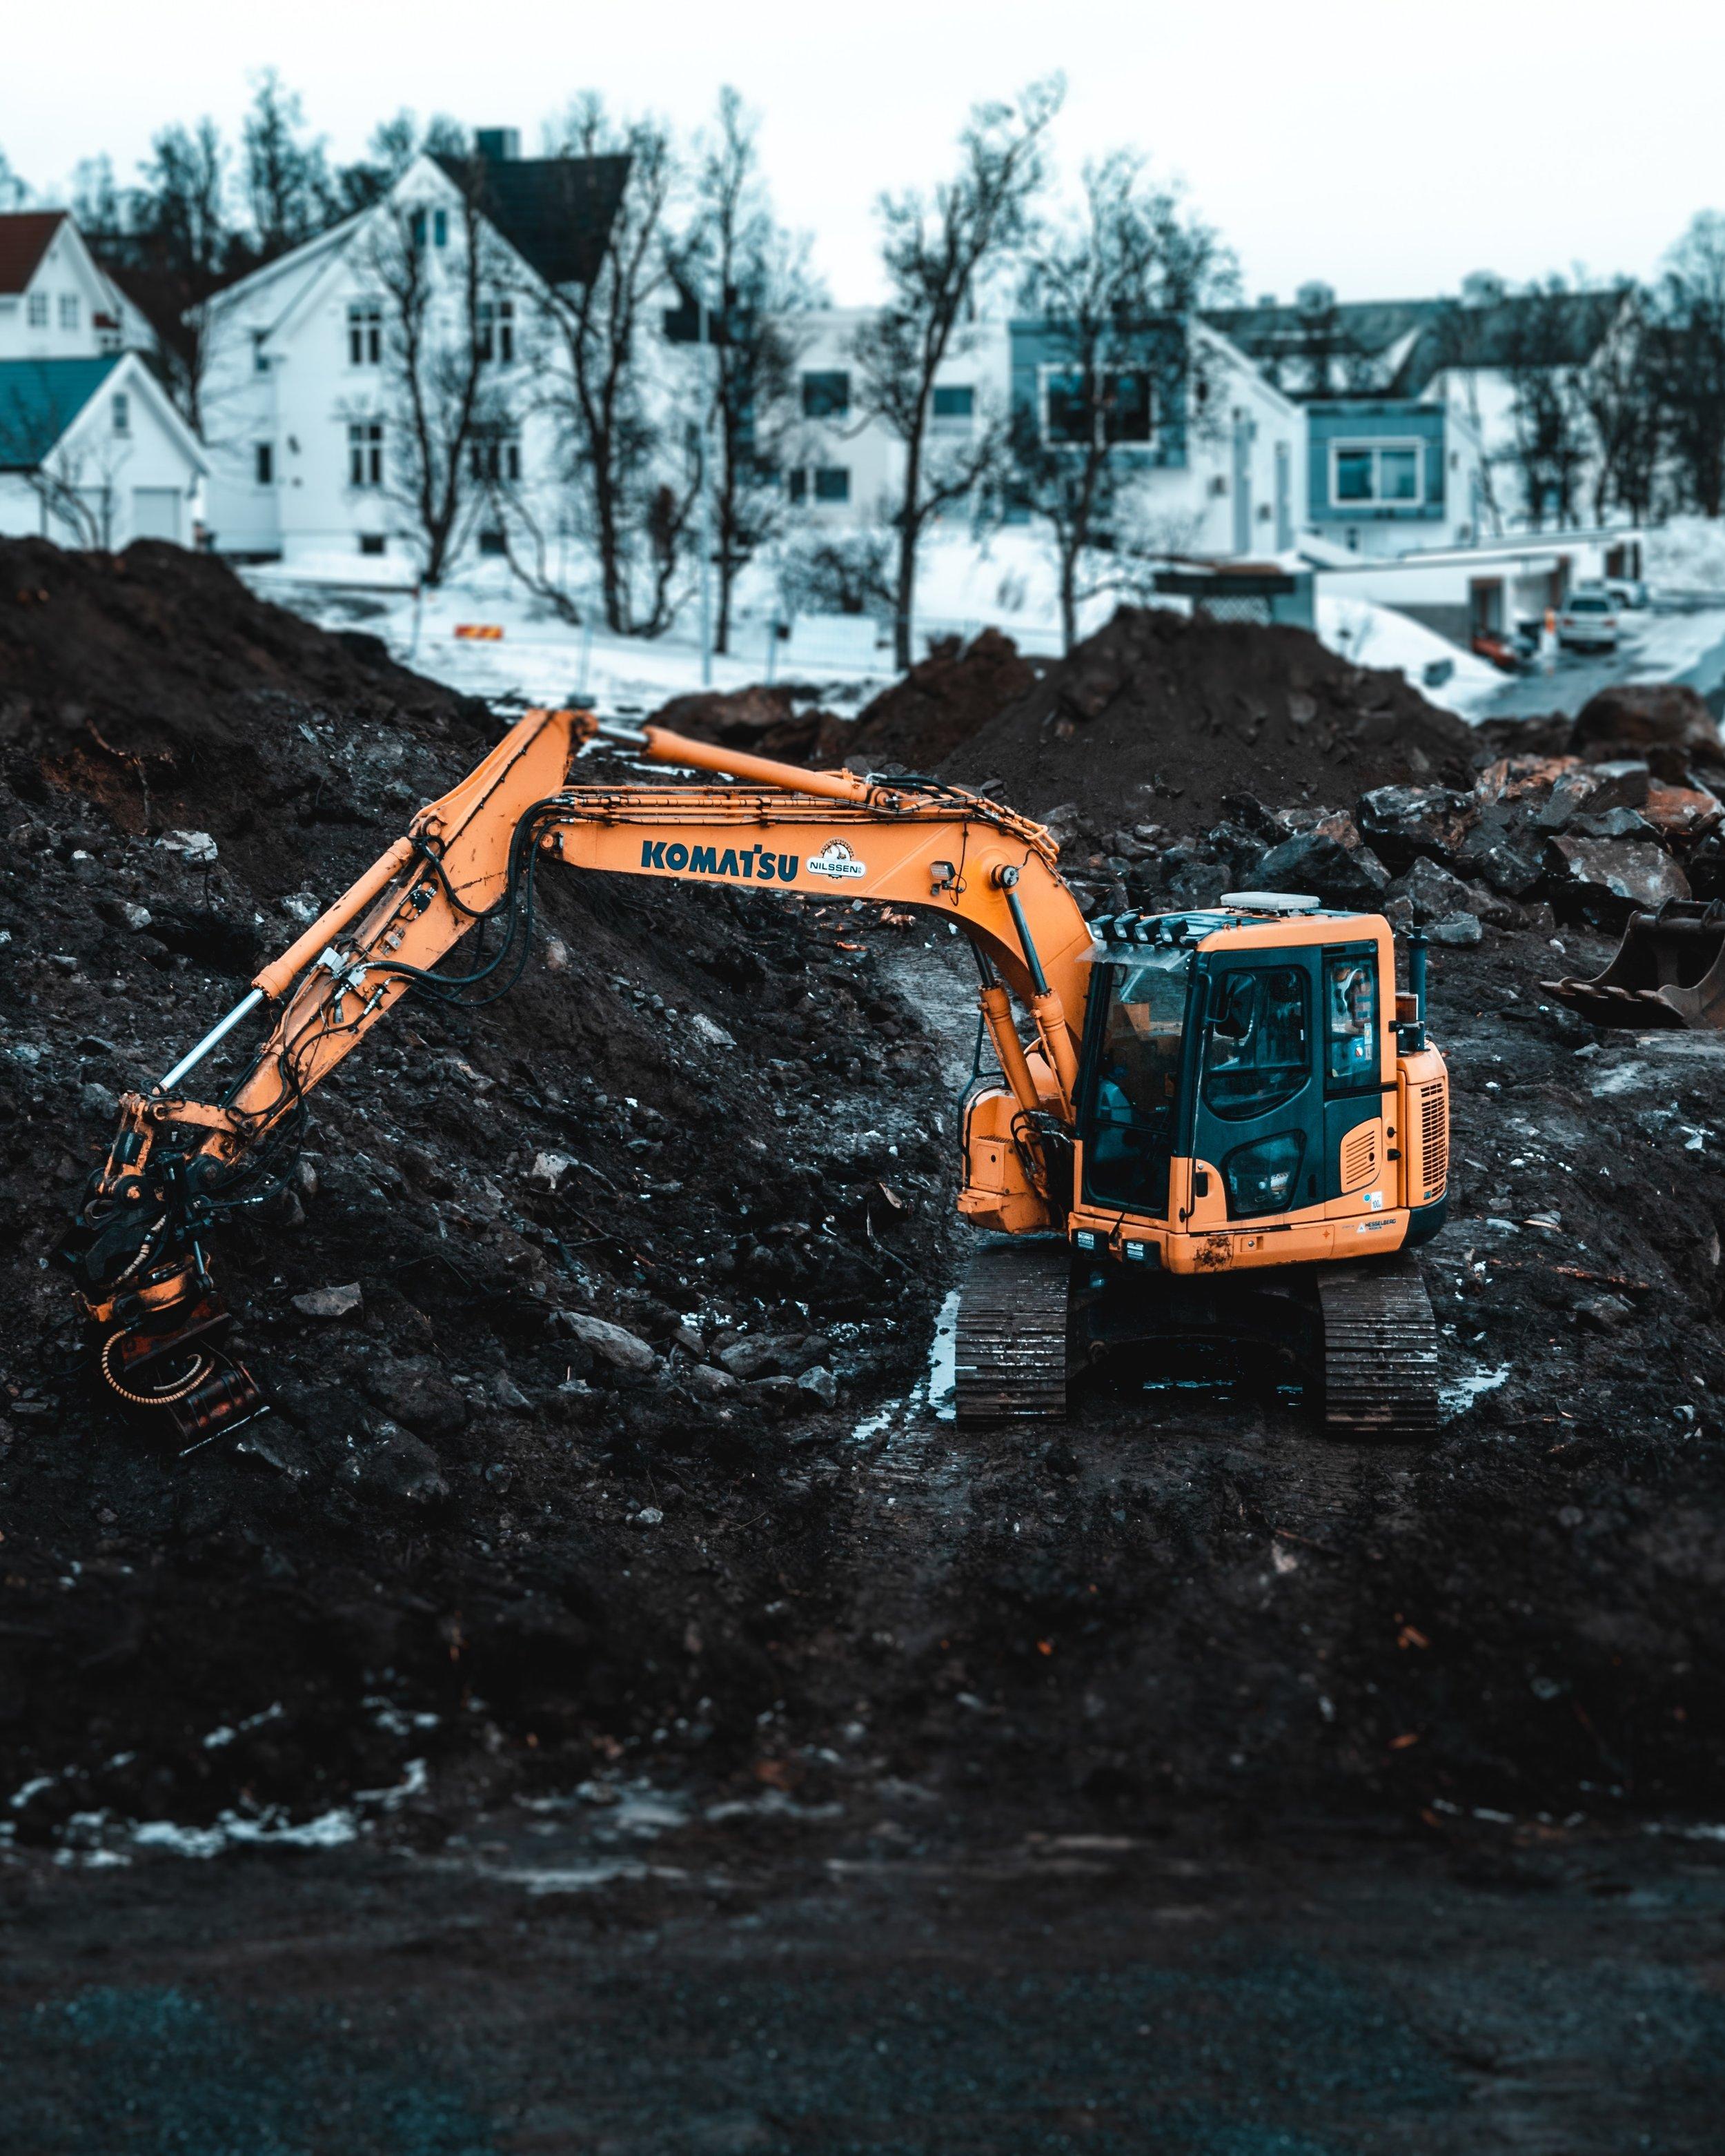 construction-site-dig-excavator-2058729.jpg